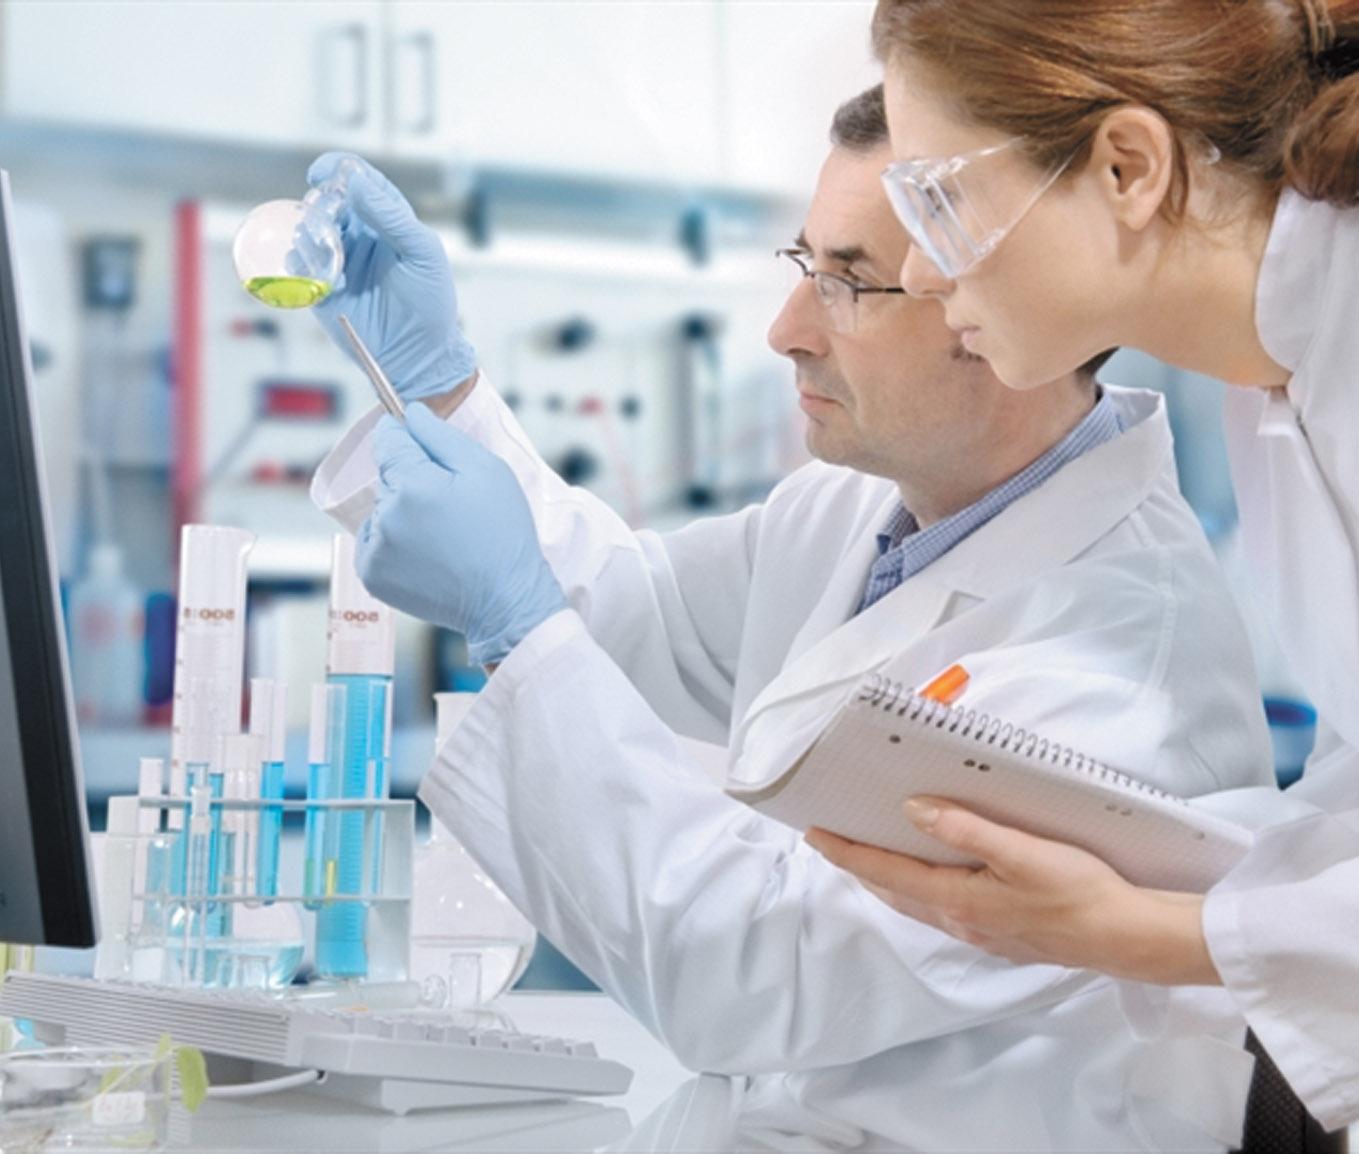 New Technology Reminds Patients to Get Important Diagnostics